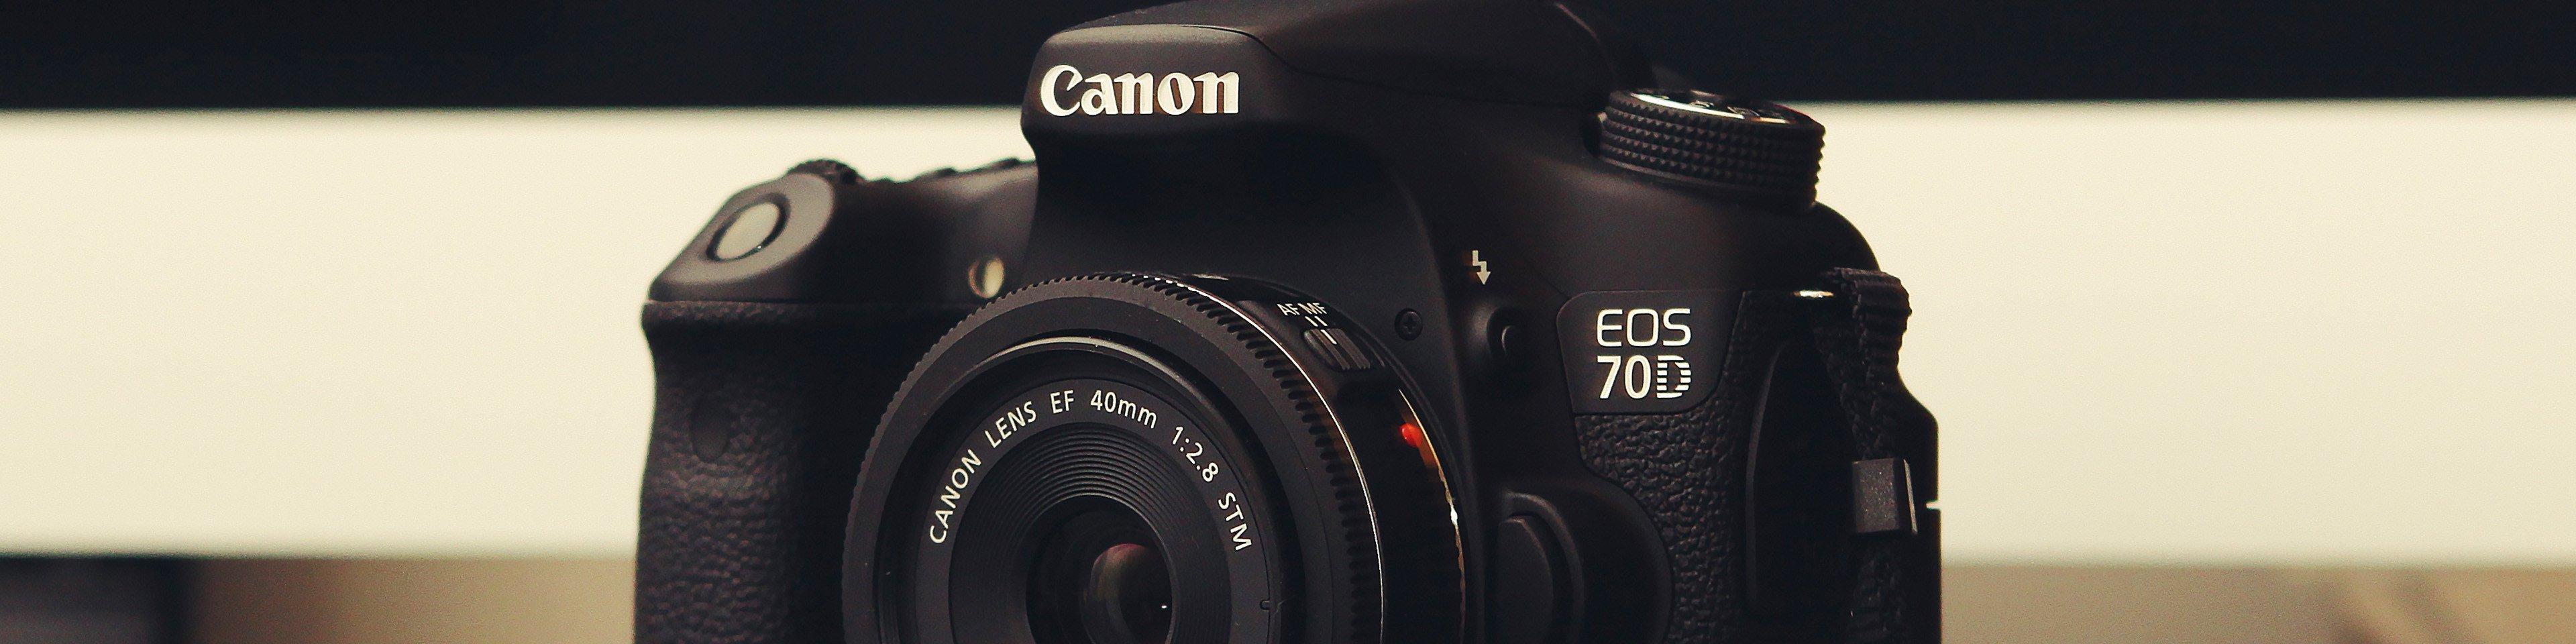 New Camera Gear – Canon EOS 70D